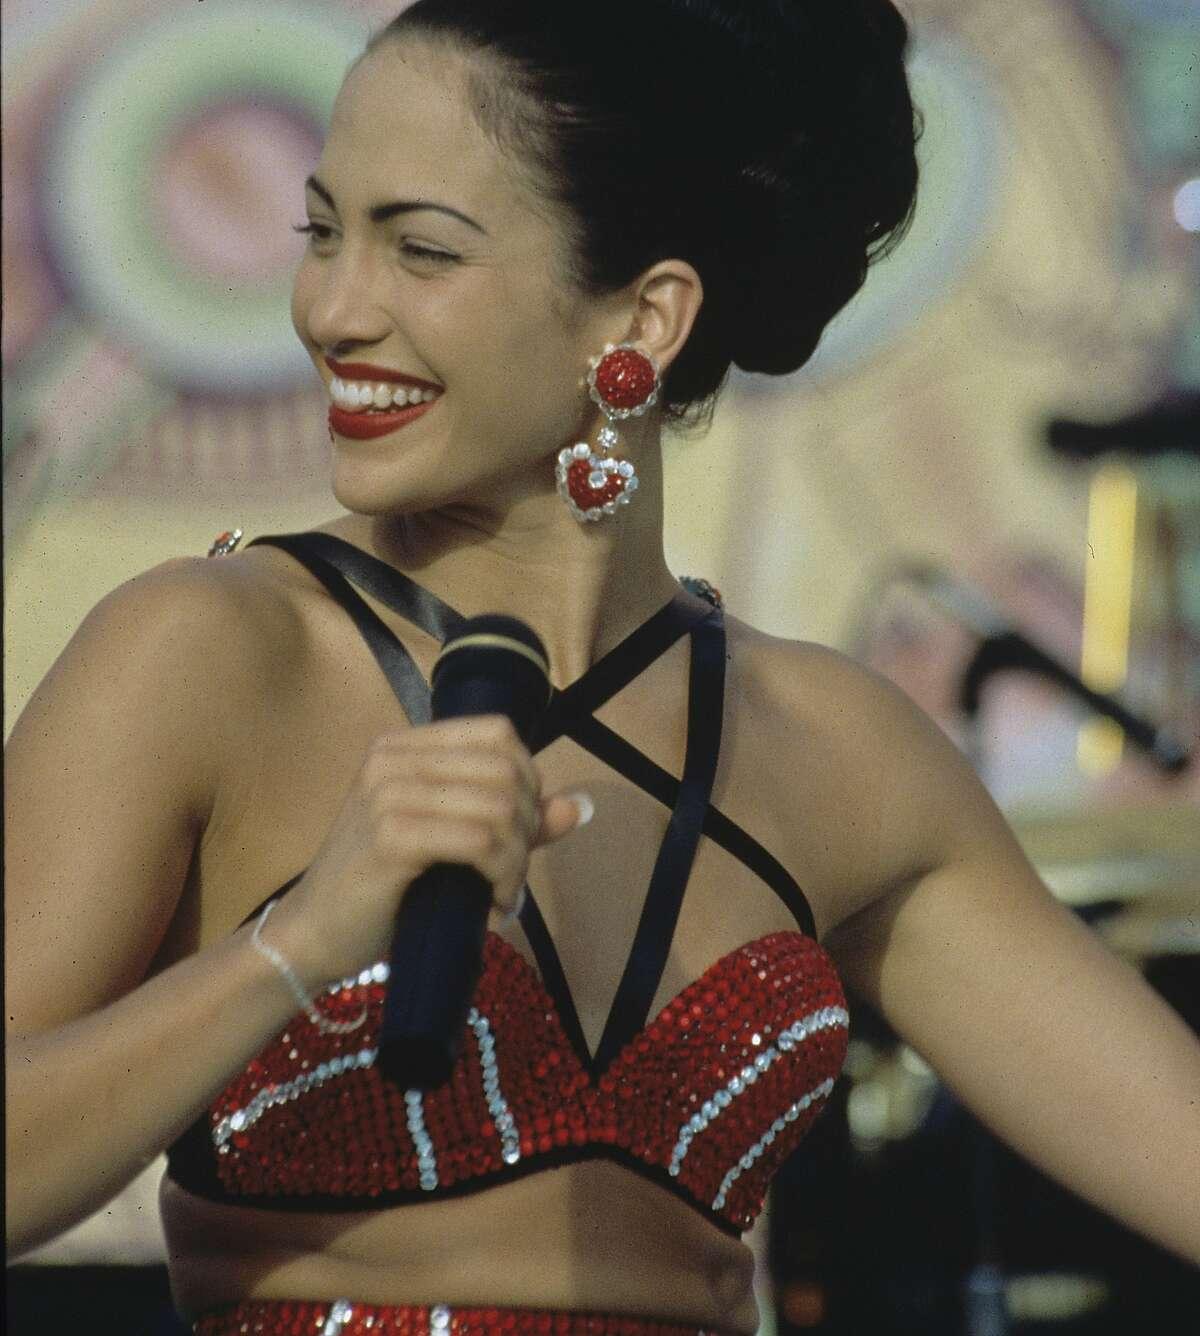 Jennifer Lopez portrayed the singer in the 1997 film,